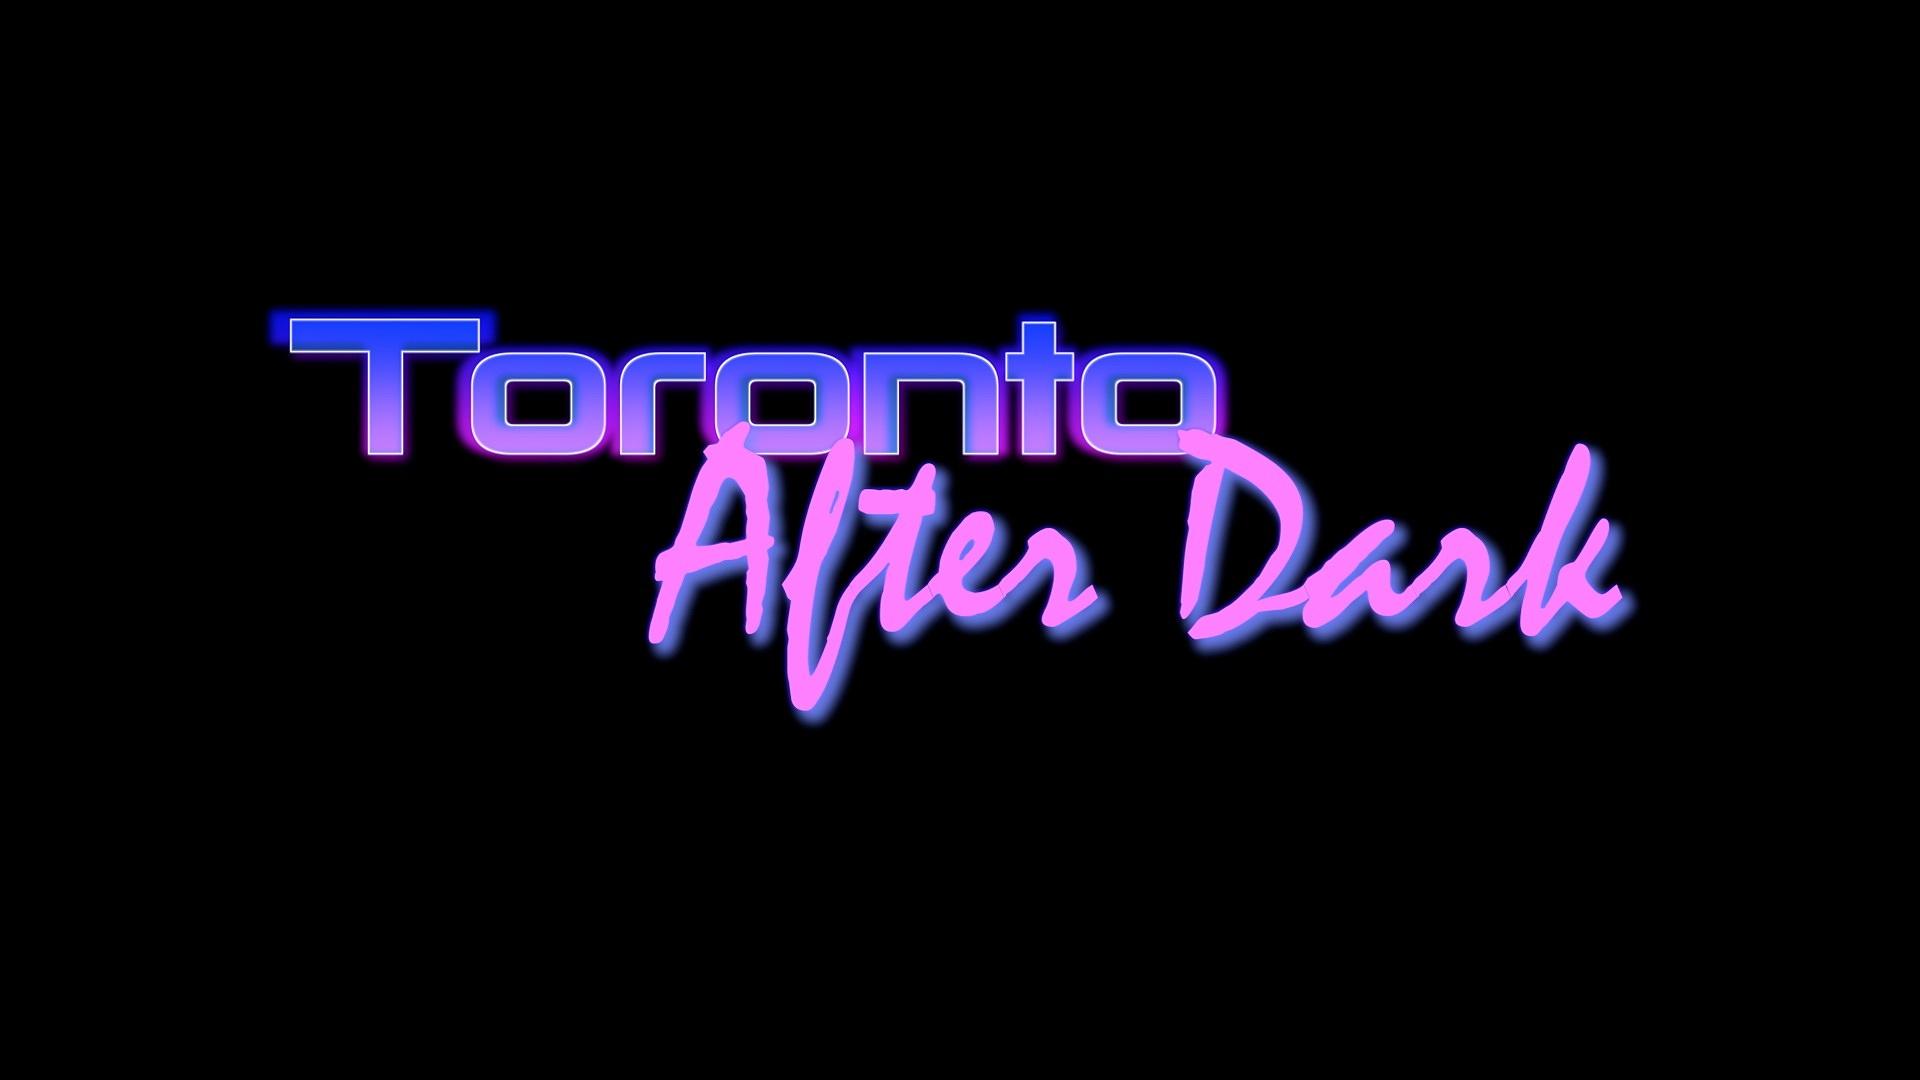 Toronto After Dark Title Card